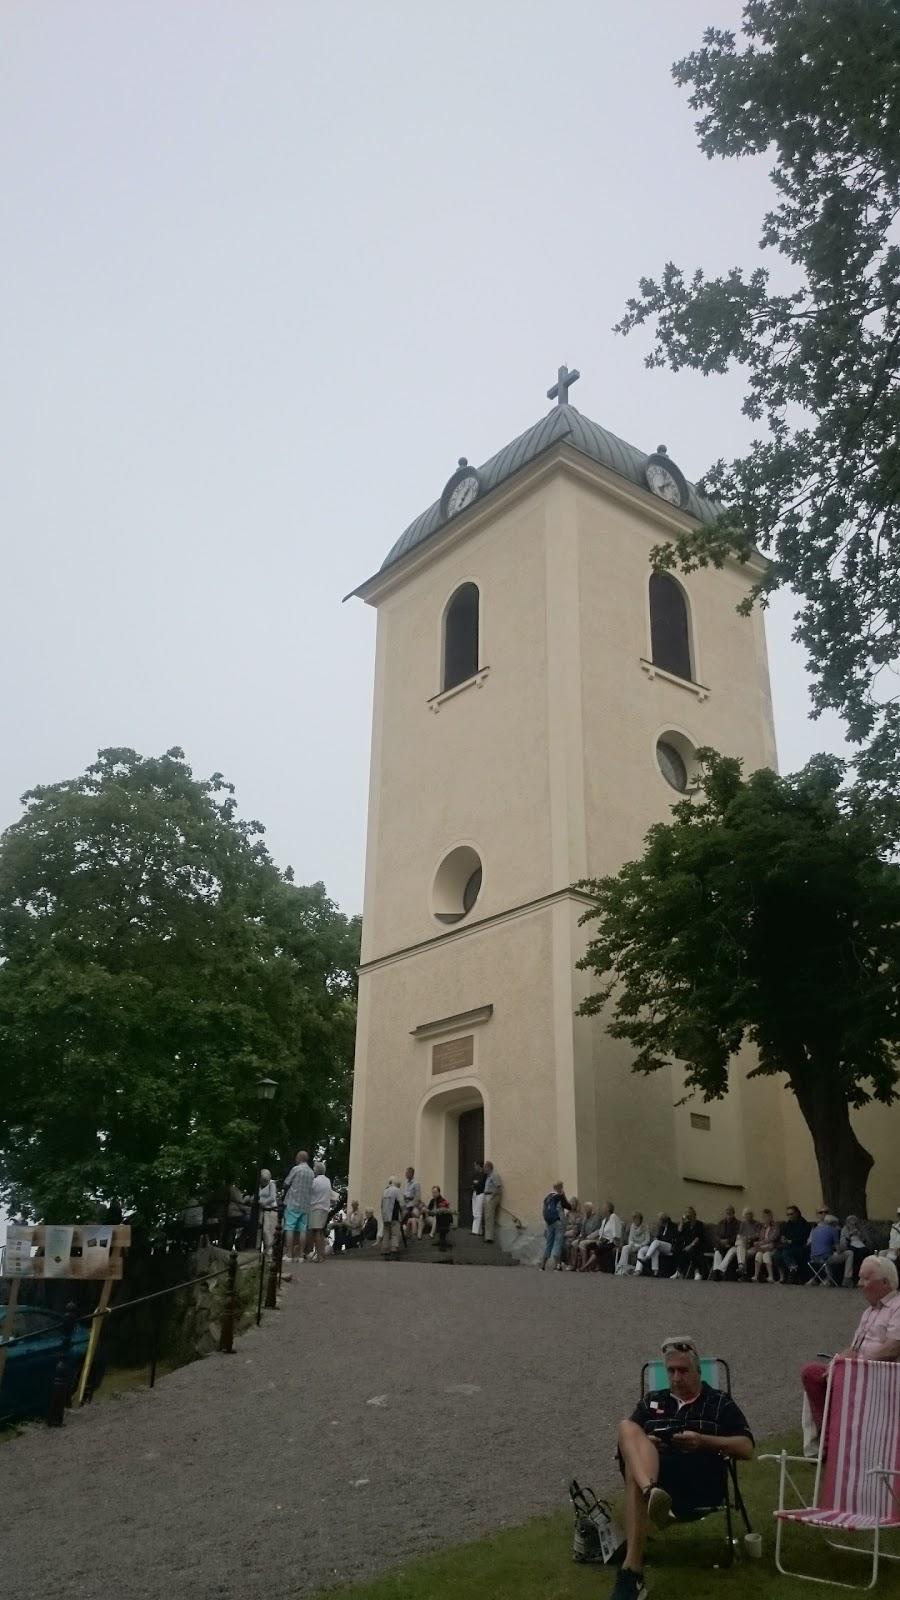 Drothems Kyrkogård